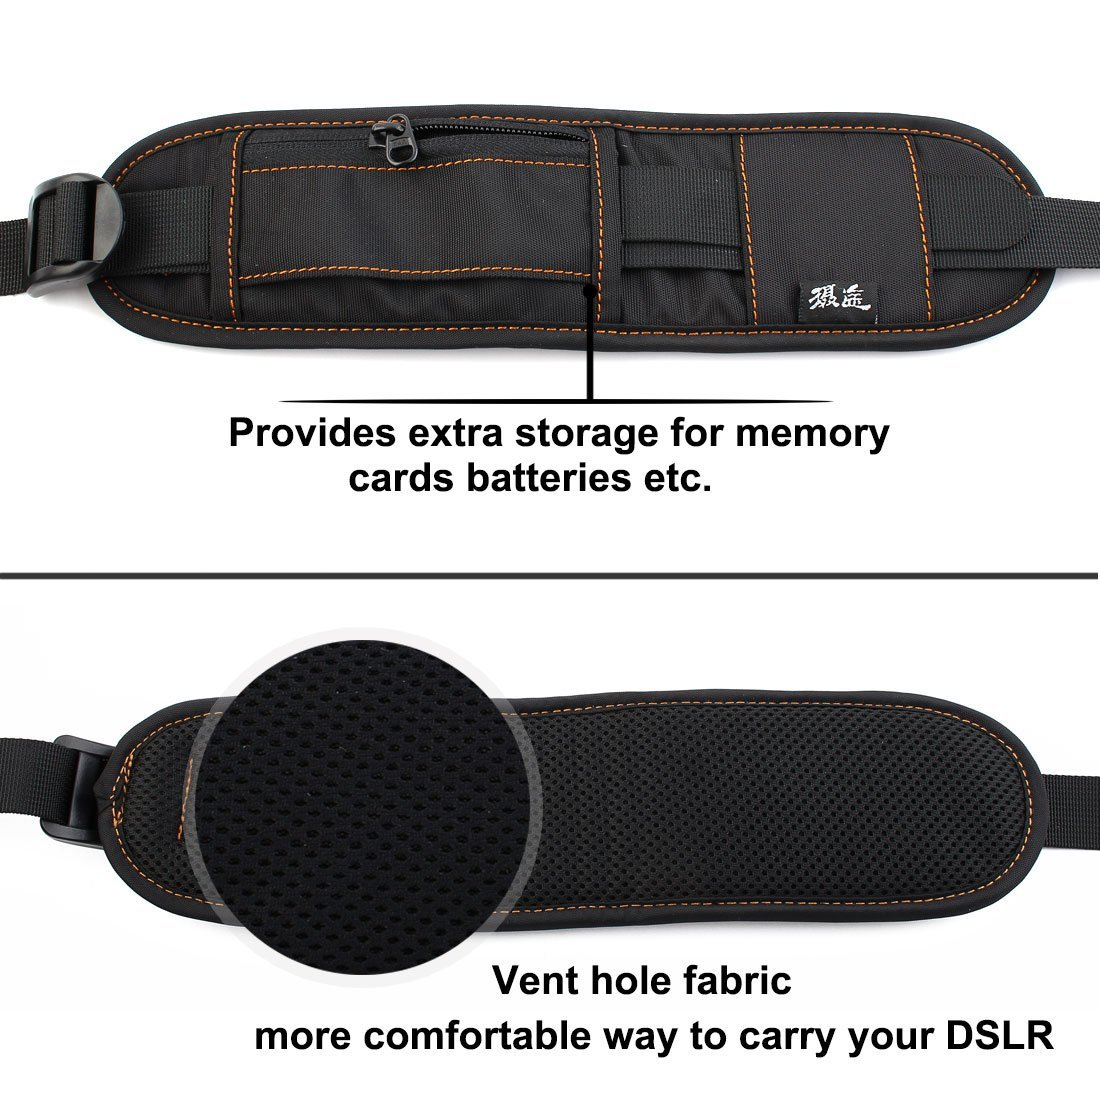 Amazon.com: eDealMax SHETU autorizado cámara Digital Universal SLR Correa del cinturón Negro Para DSLR: Electronics